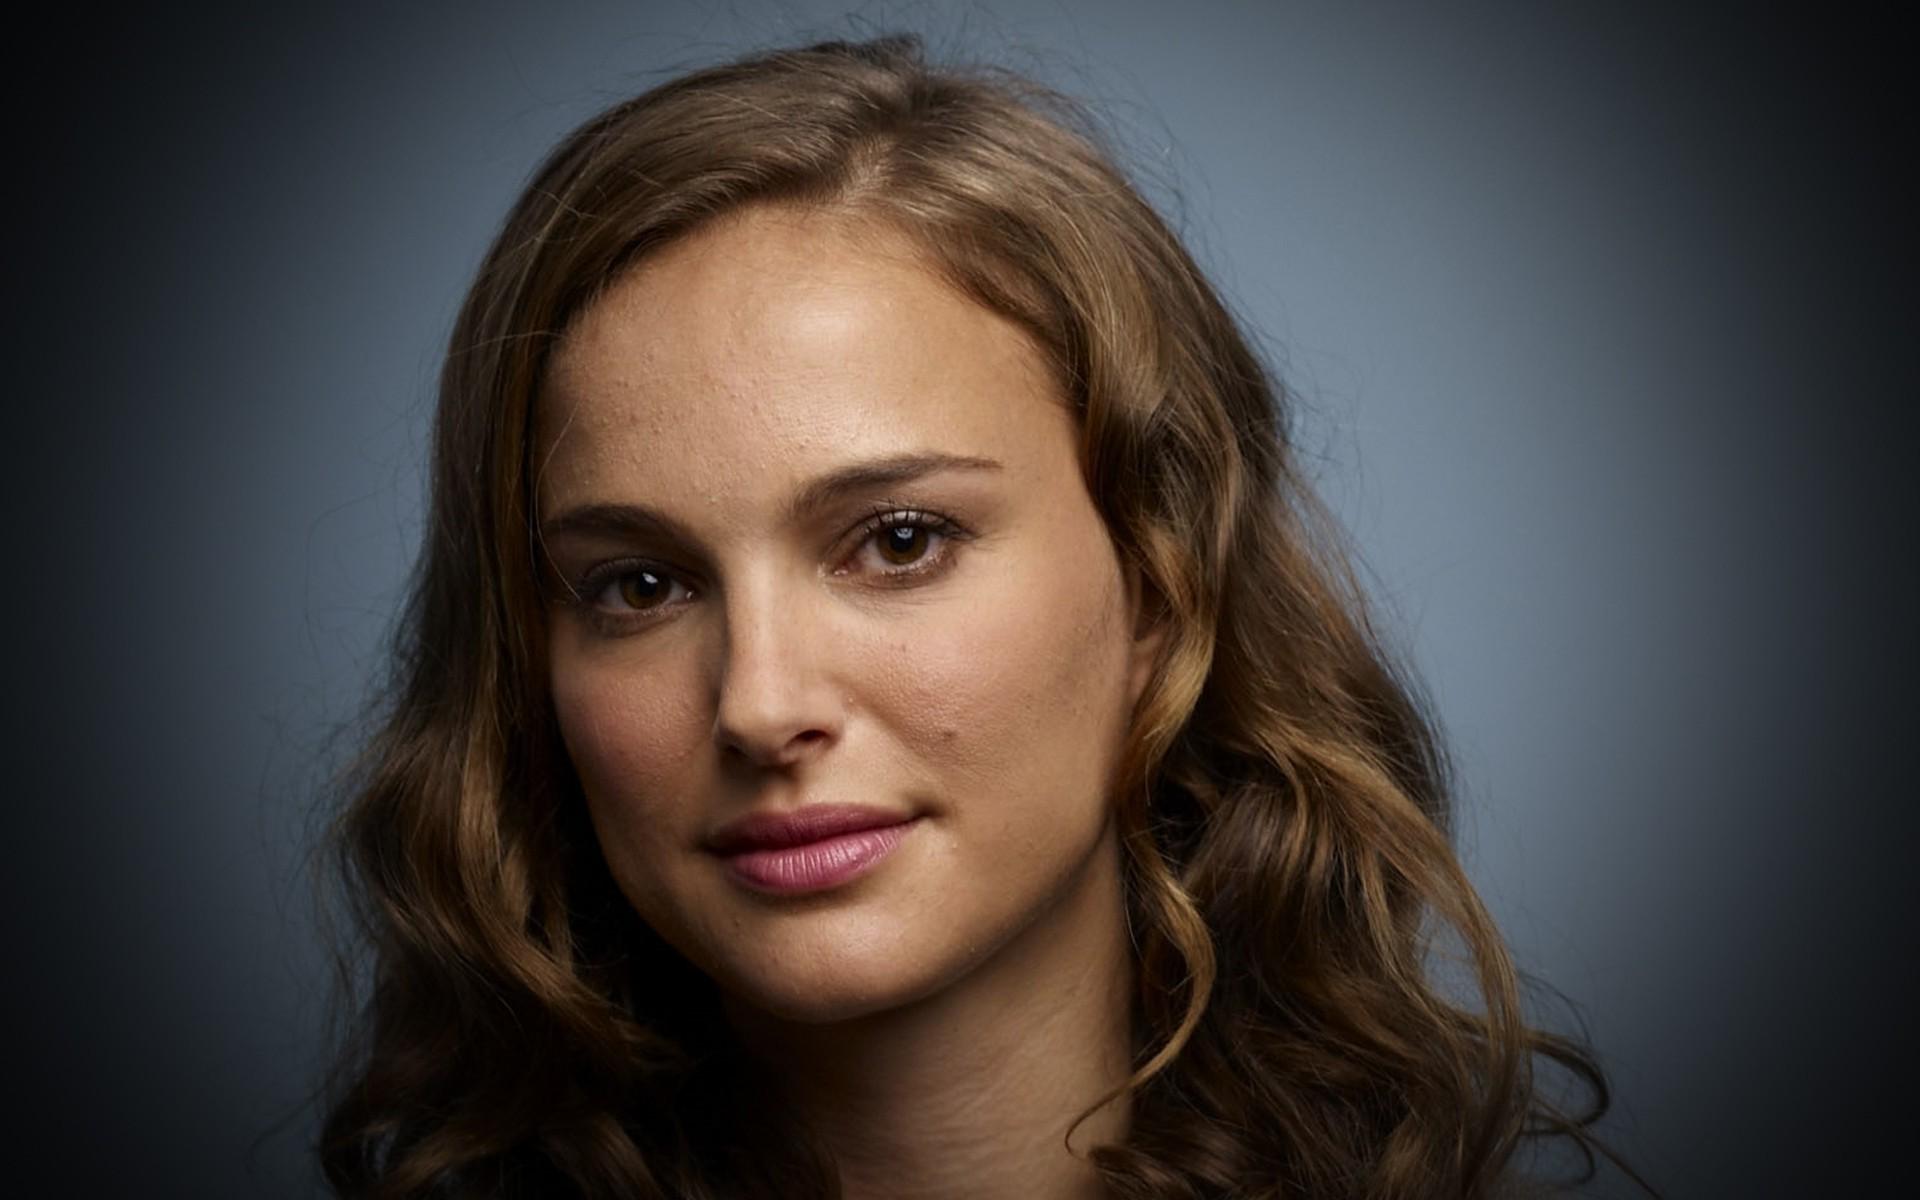 Natalie Portman Picture 20 HD Screensavers